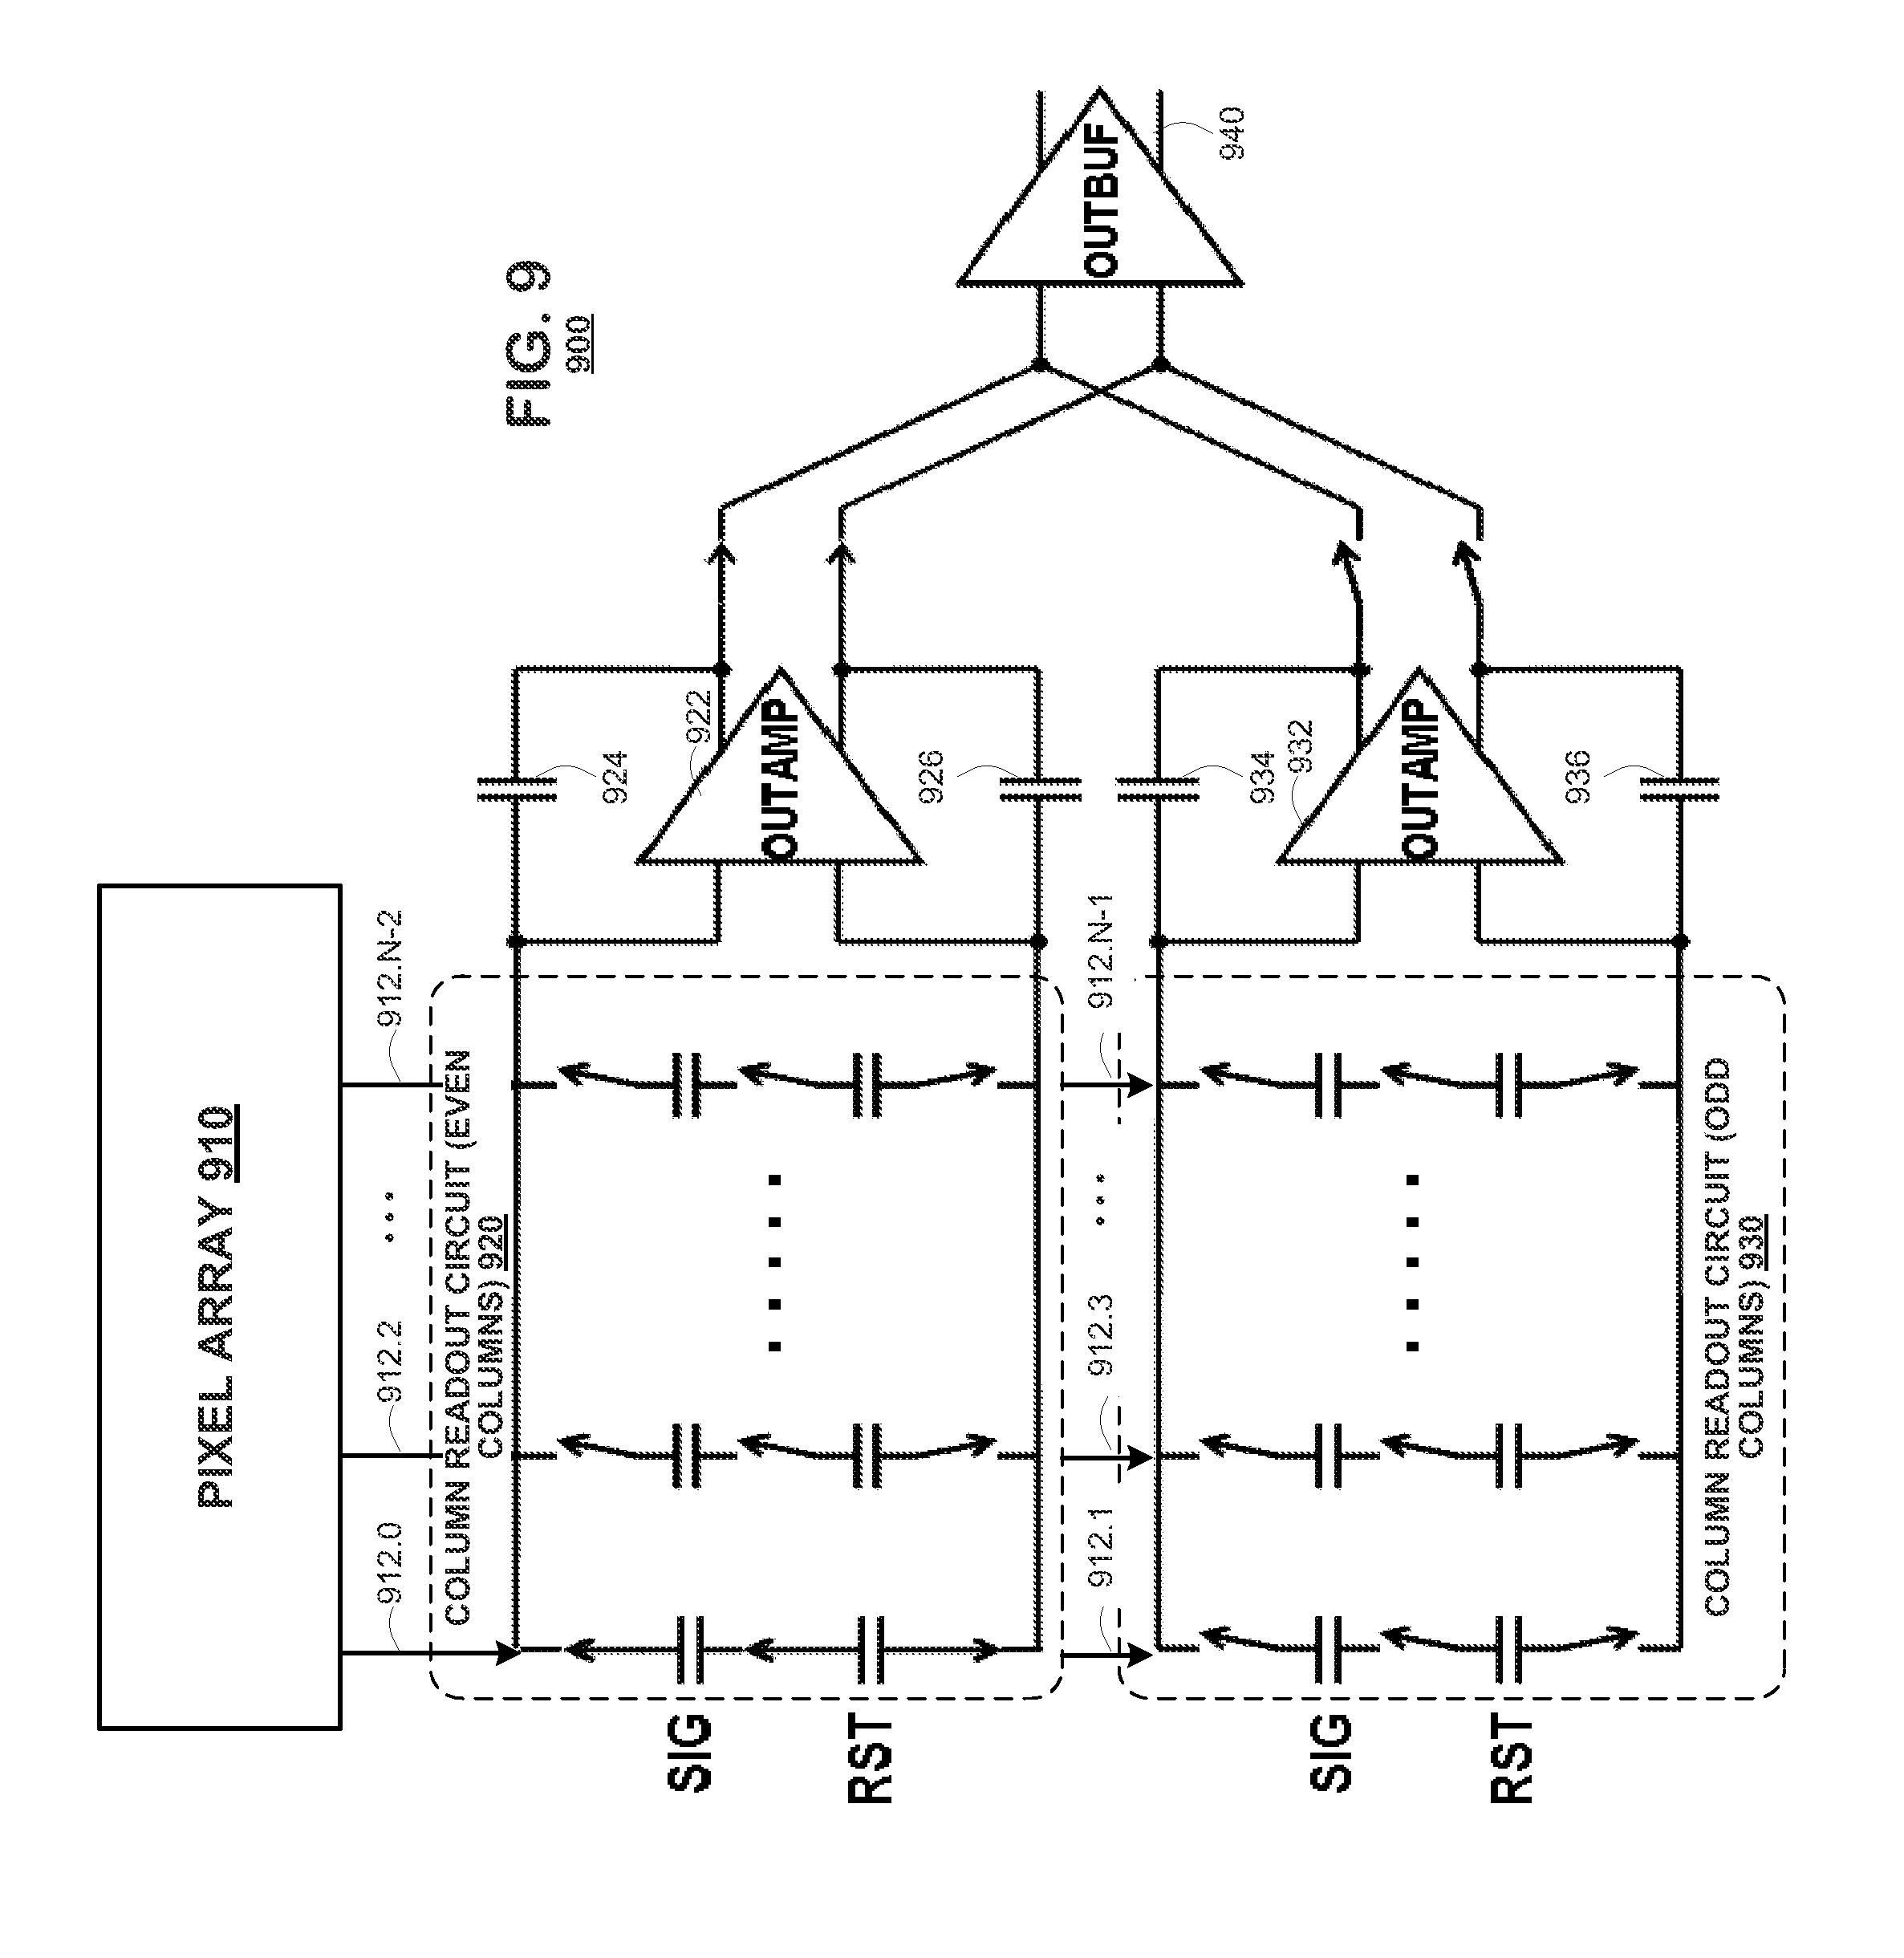 Patente Us8493139 Low Noise Auto Zero Circuits For Amplifiers Analog Acquisition Circuit Amplifiercircuit Diagram Patent Drawing